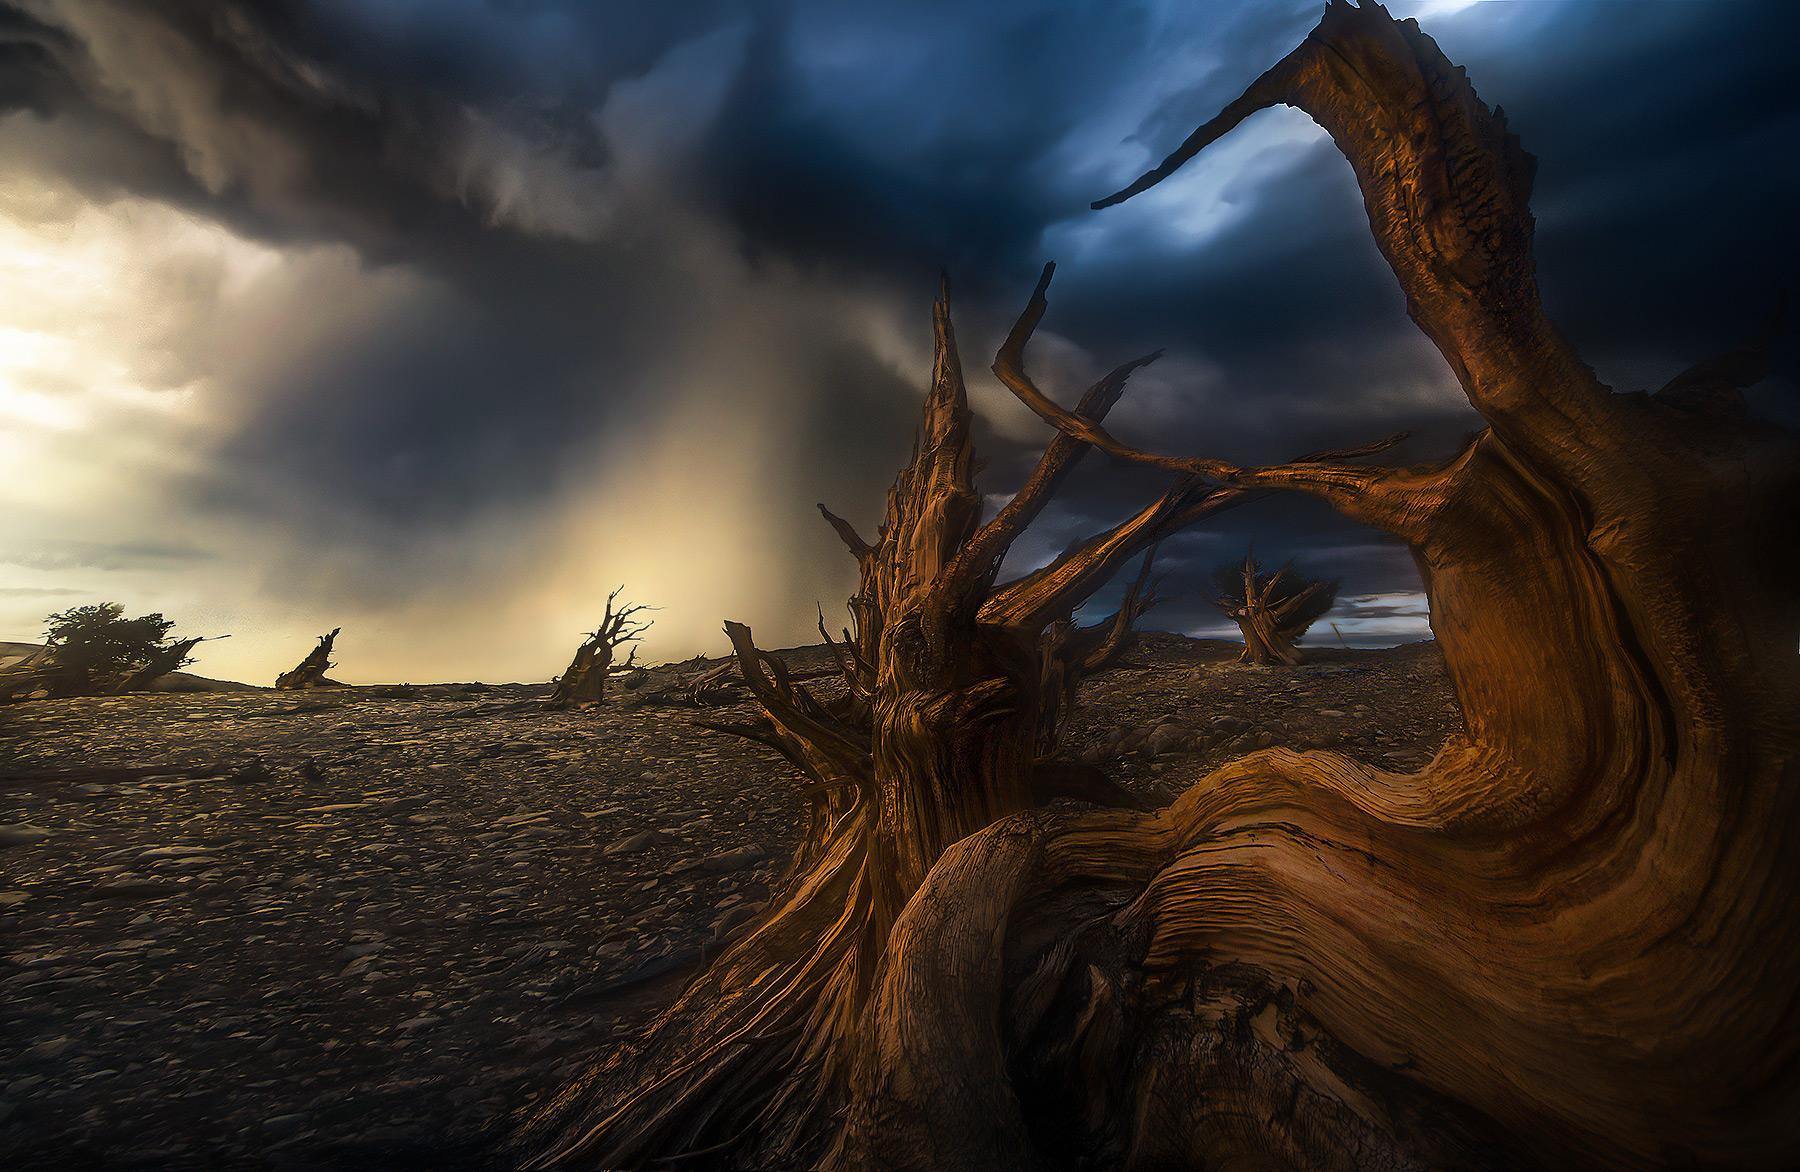 Sunset light through the storm, ancient Bristlecone Pine.